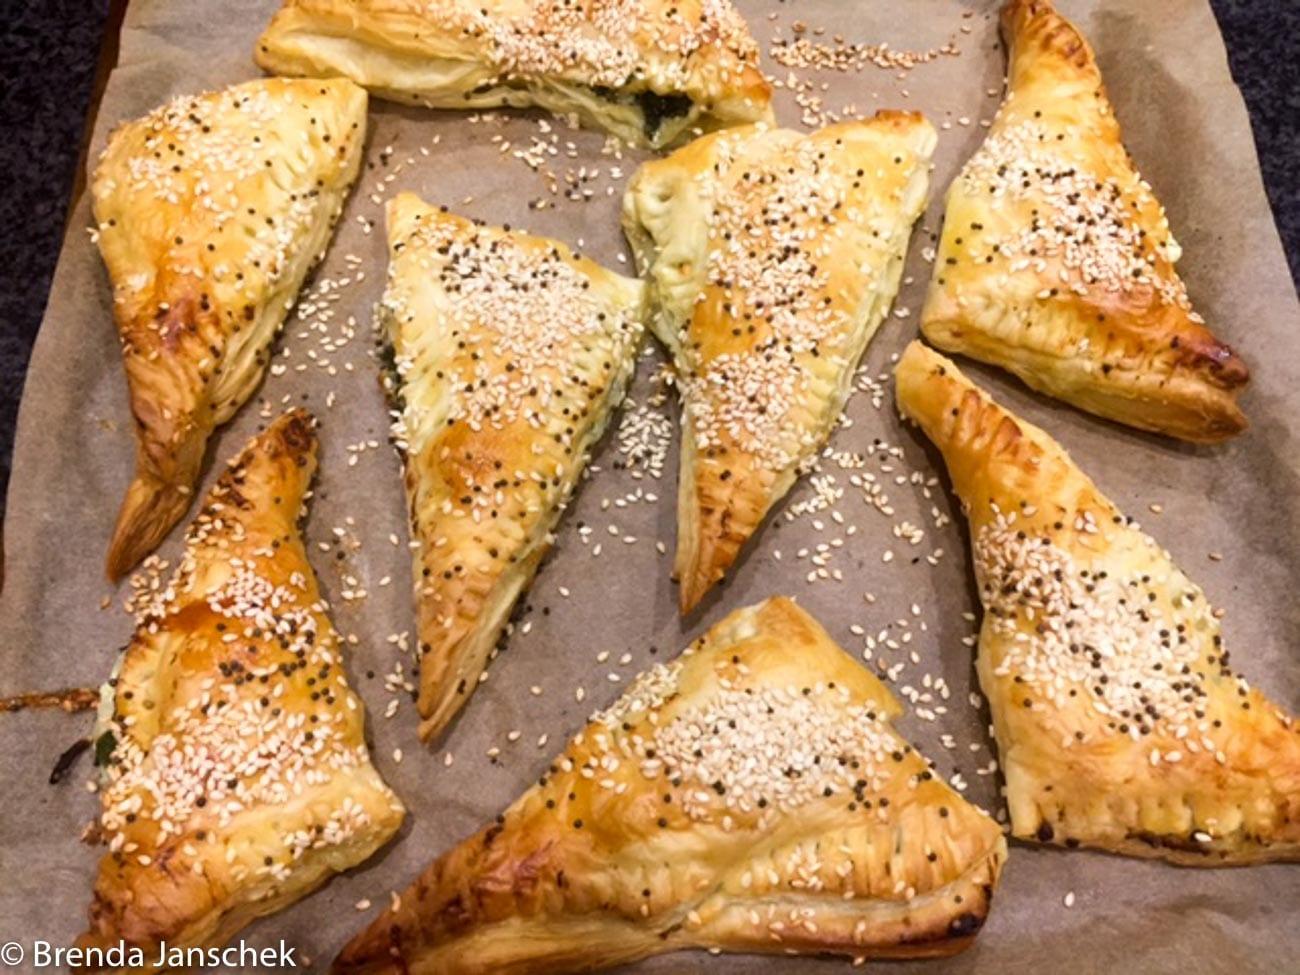 Brenda-Janschek-Recipe-Cheese-Spinach-Triangles-Tray-Feature.jpg